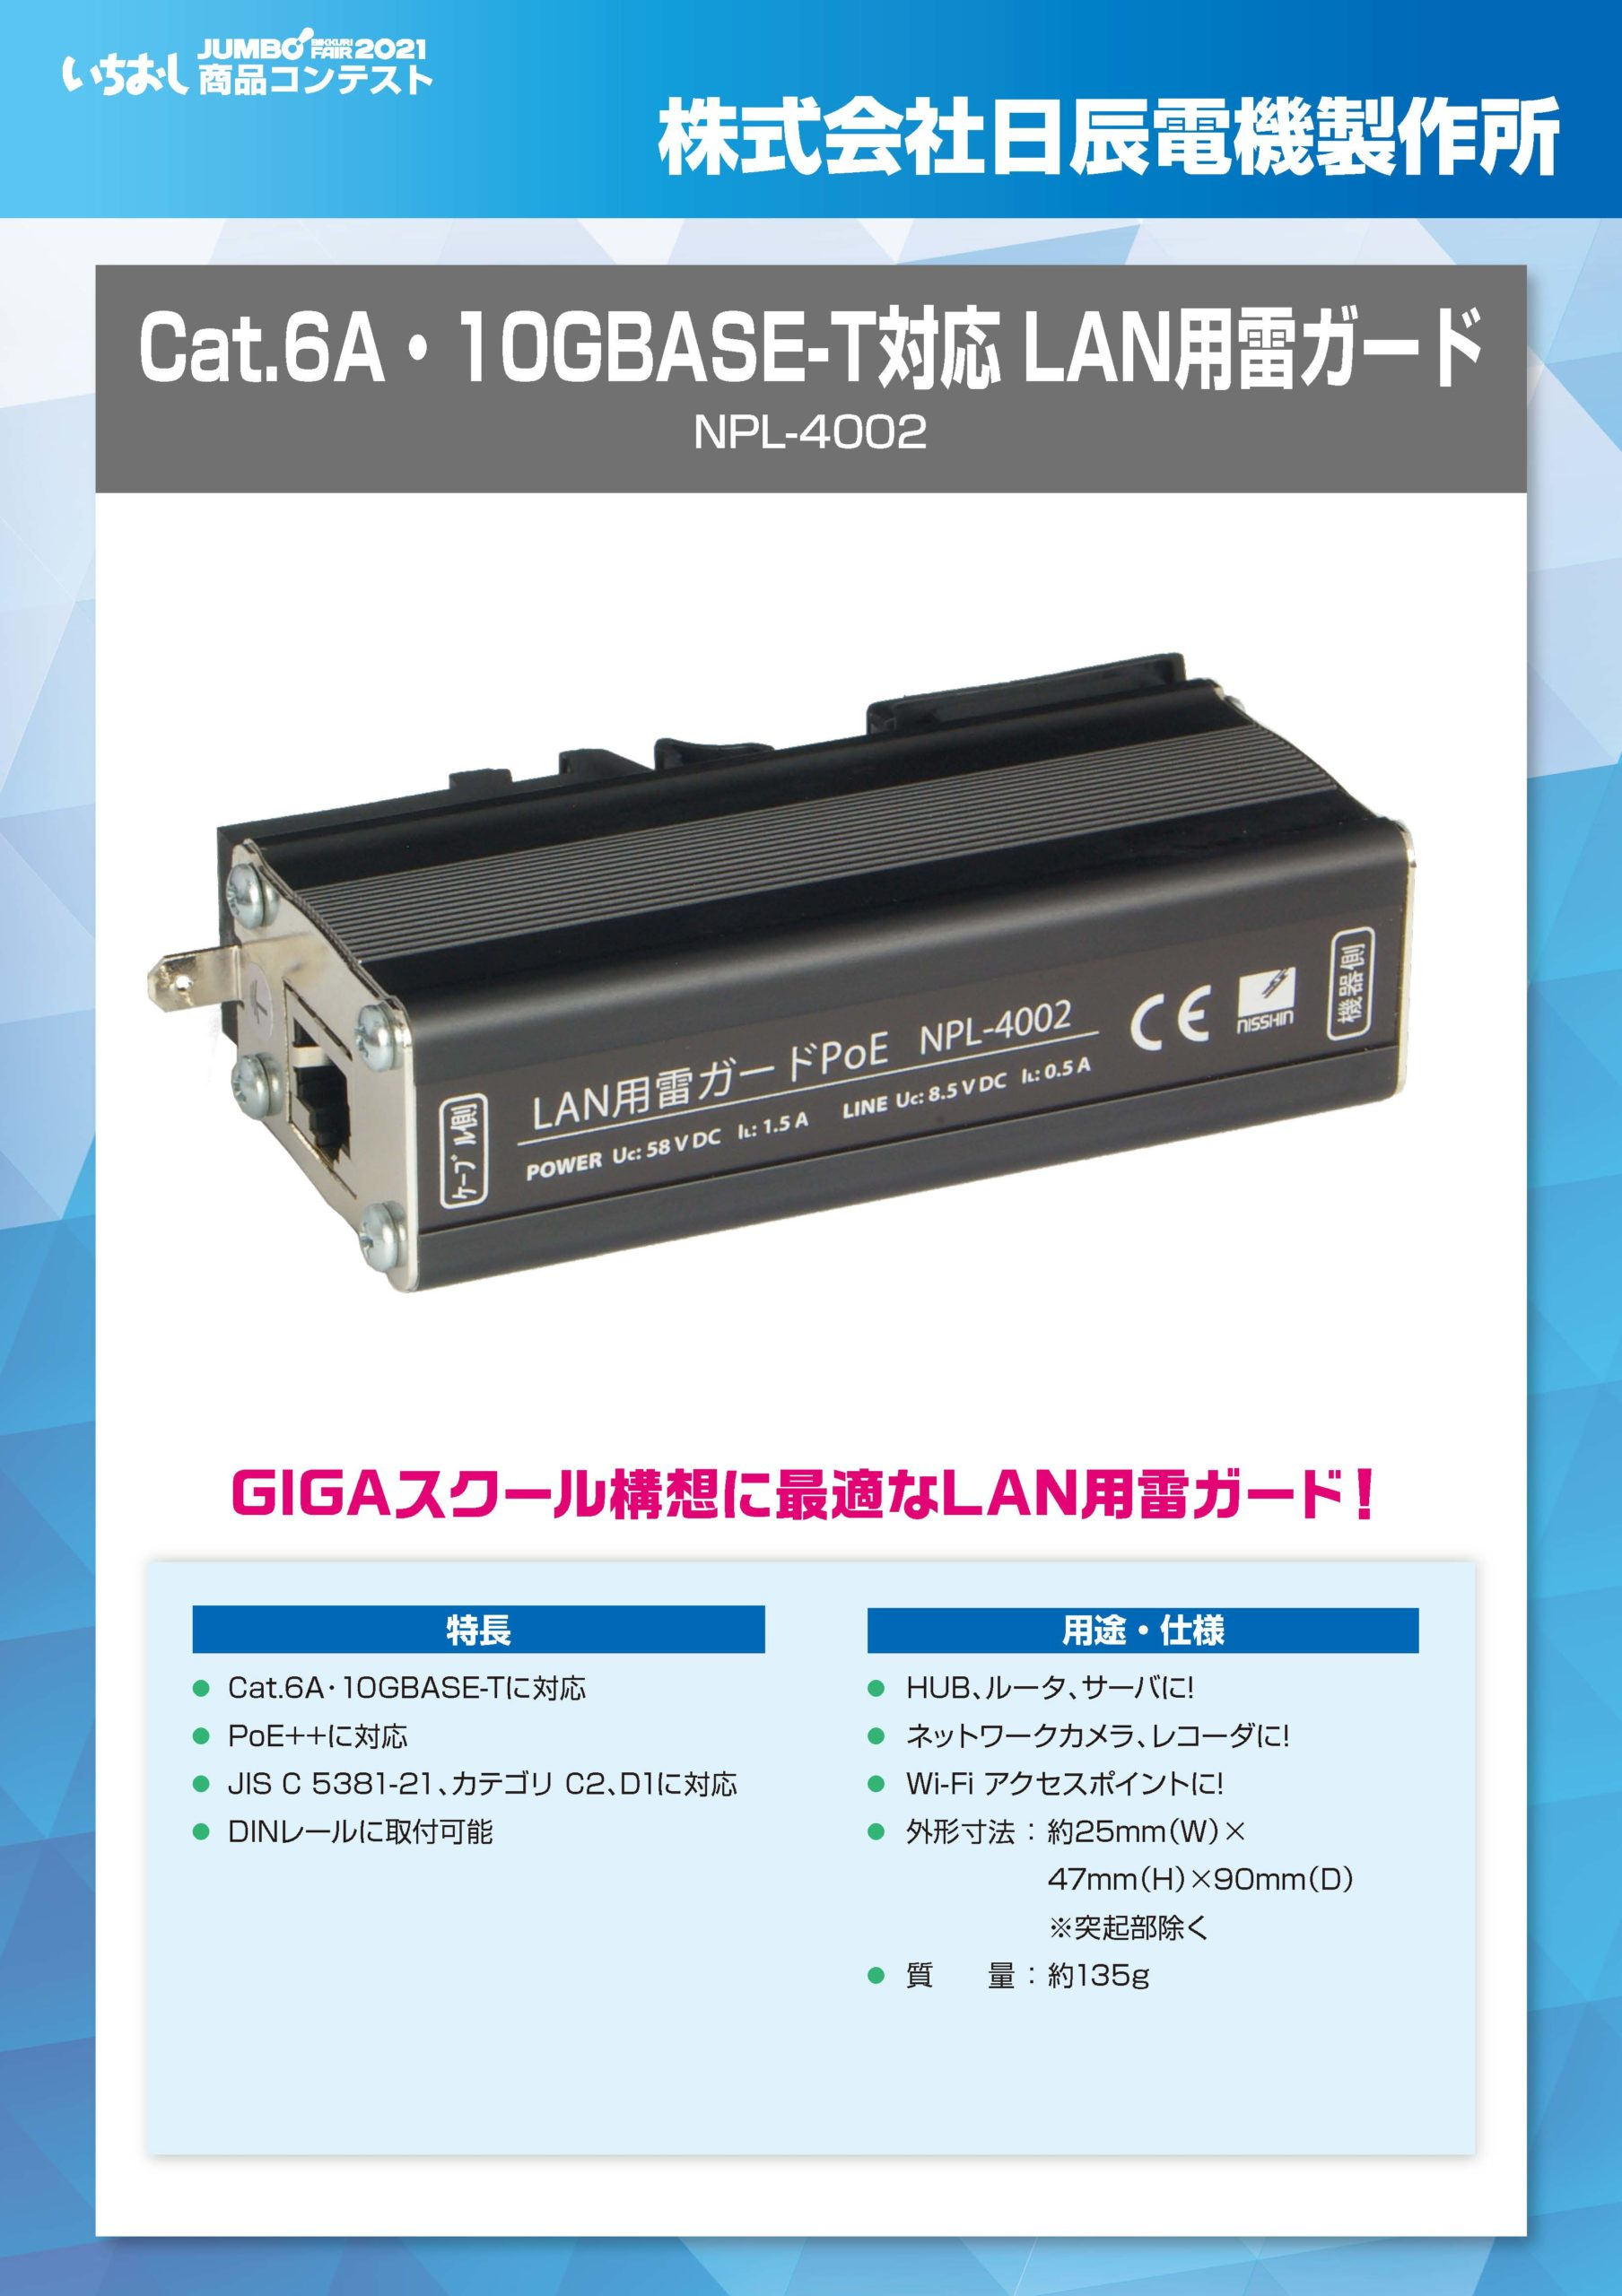 「Cat.6A・10GBASE-T対応 LAN用雷ガード」株式会社日辰電機製作所の画像